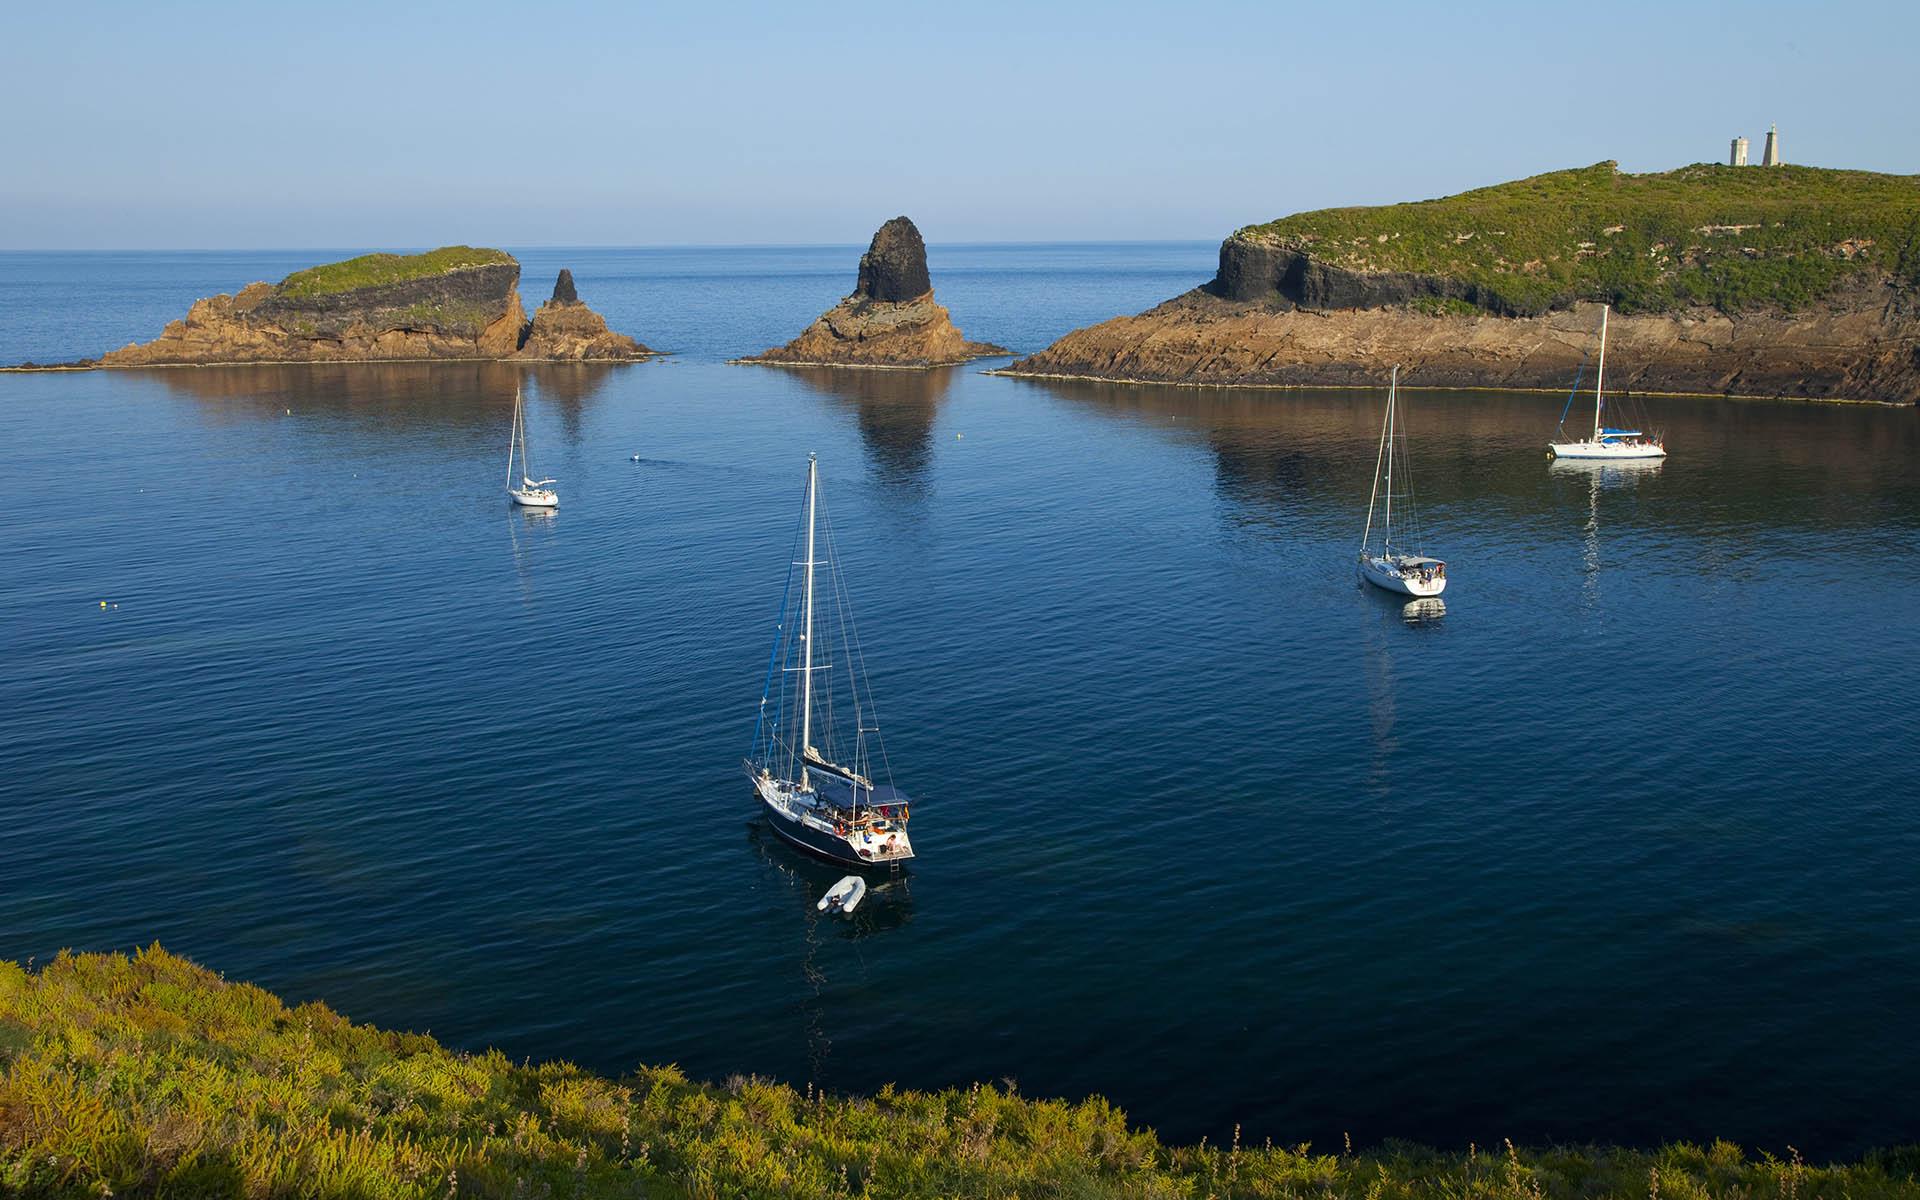 Fin de semana en las Islas Columbretes en un velero